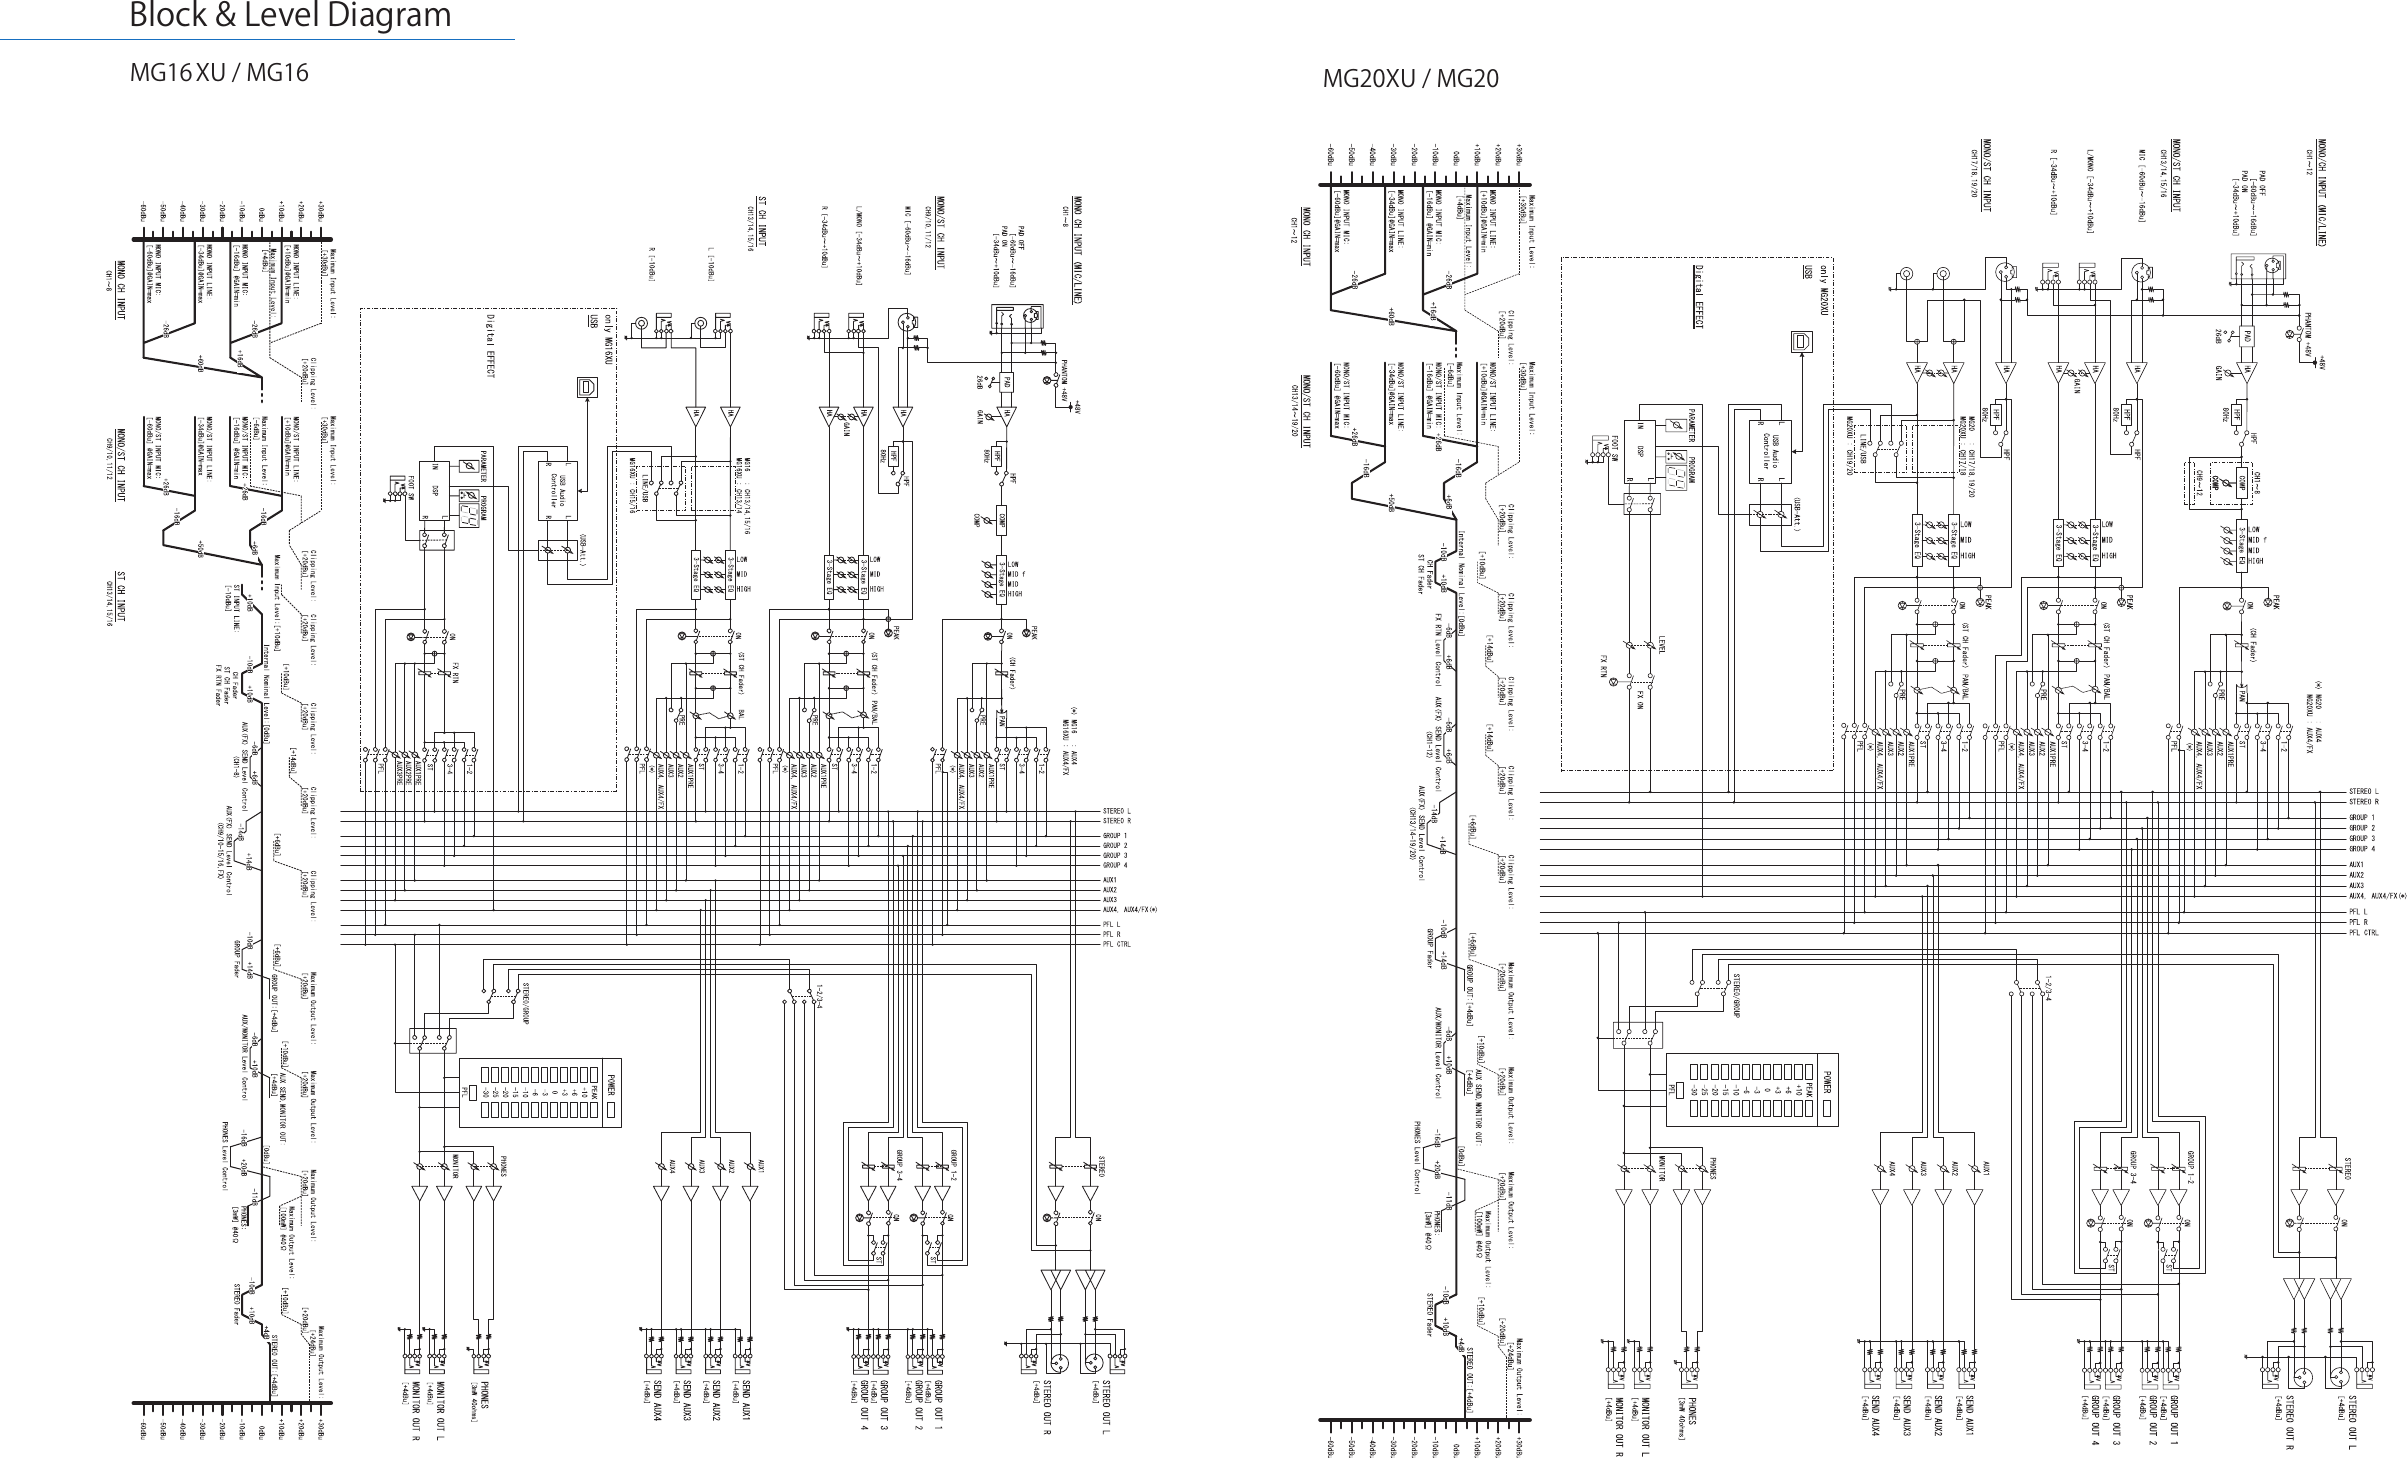 Yamaha Mg Series Block And Level Diagram